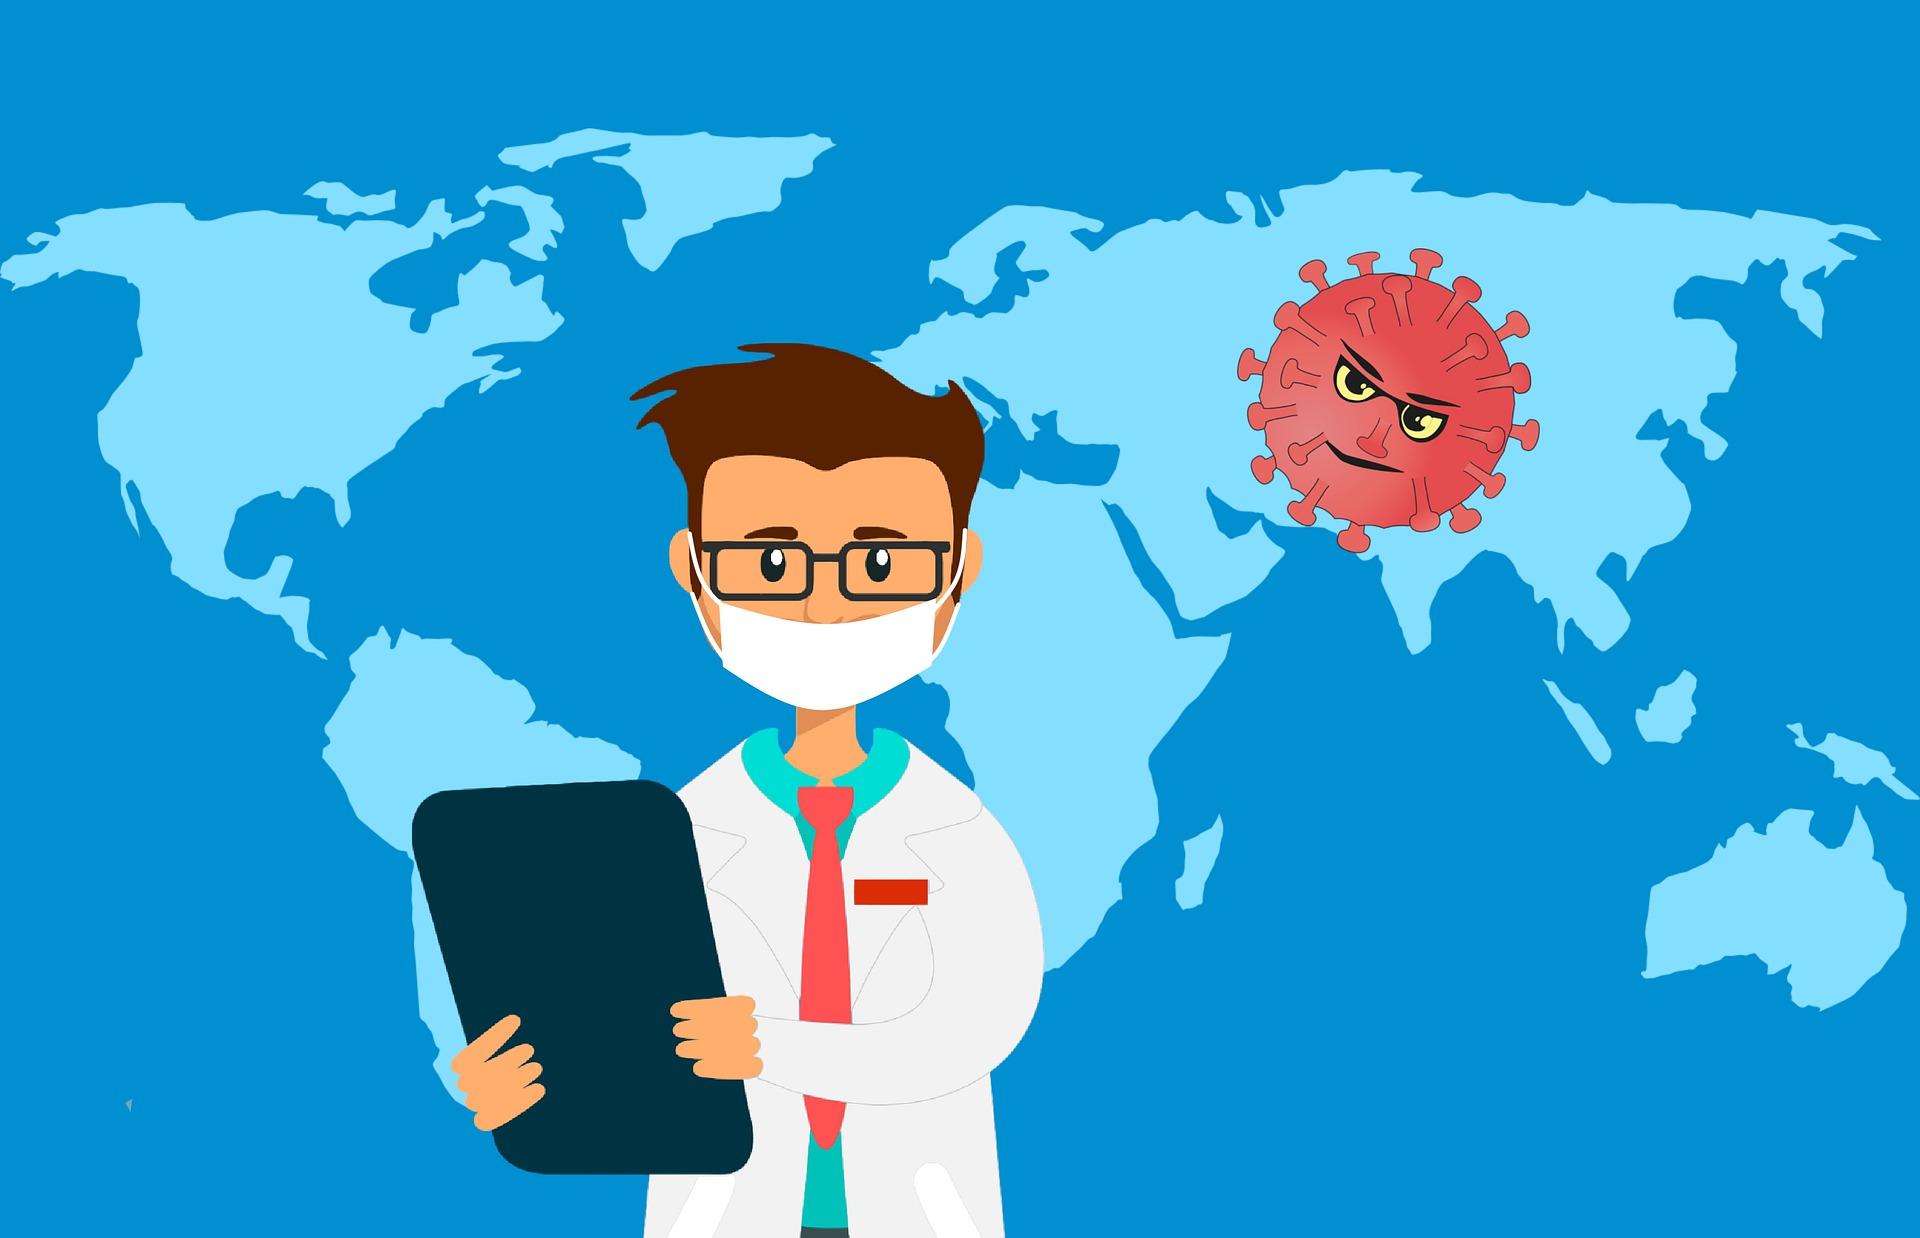 Apotheke Digitalisierung Covid Corona Pandemie SARS MERS E-Rezept eRezept